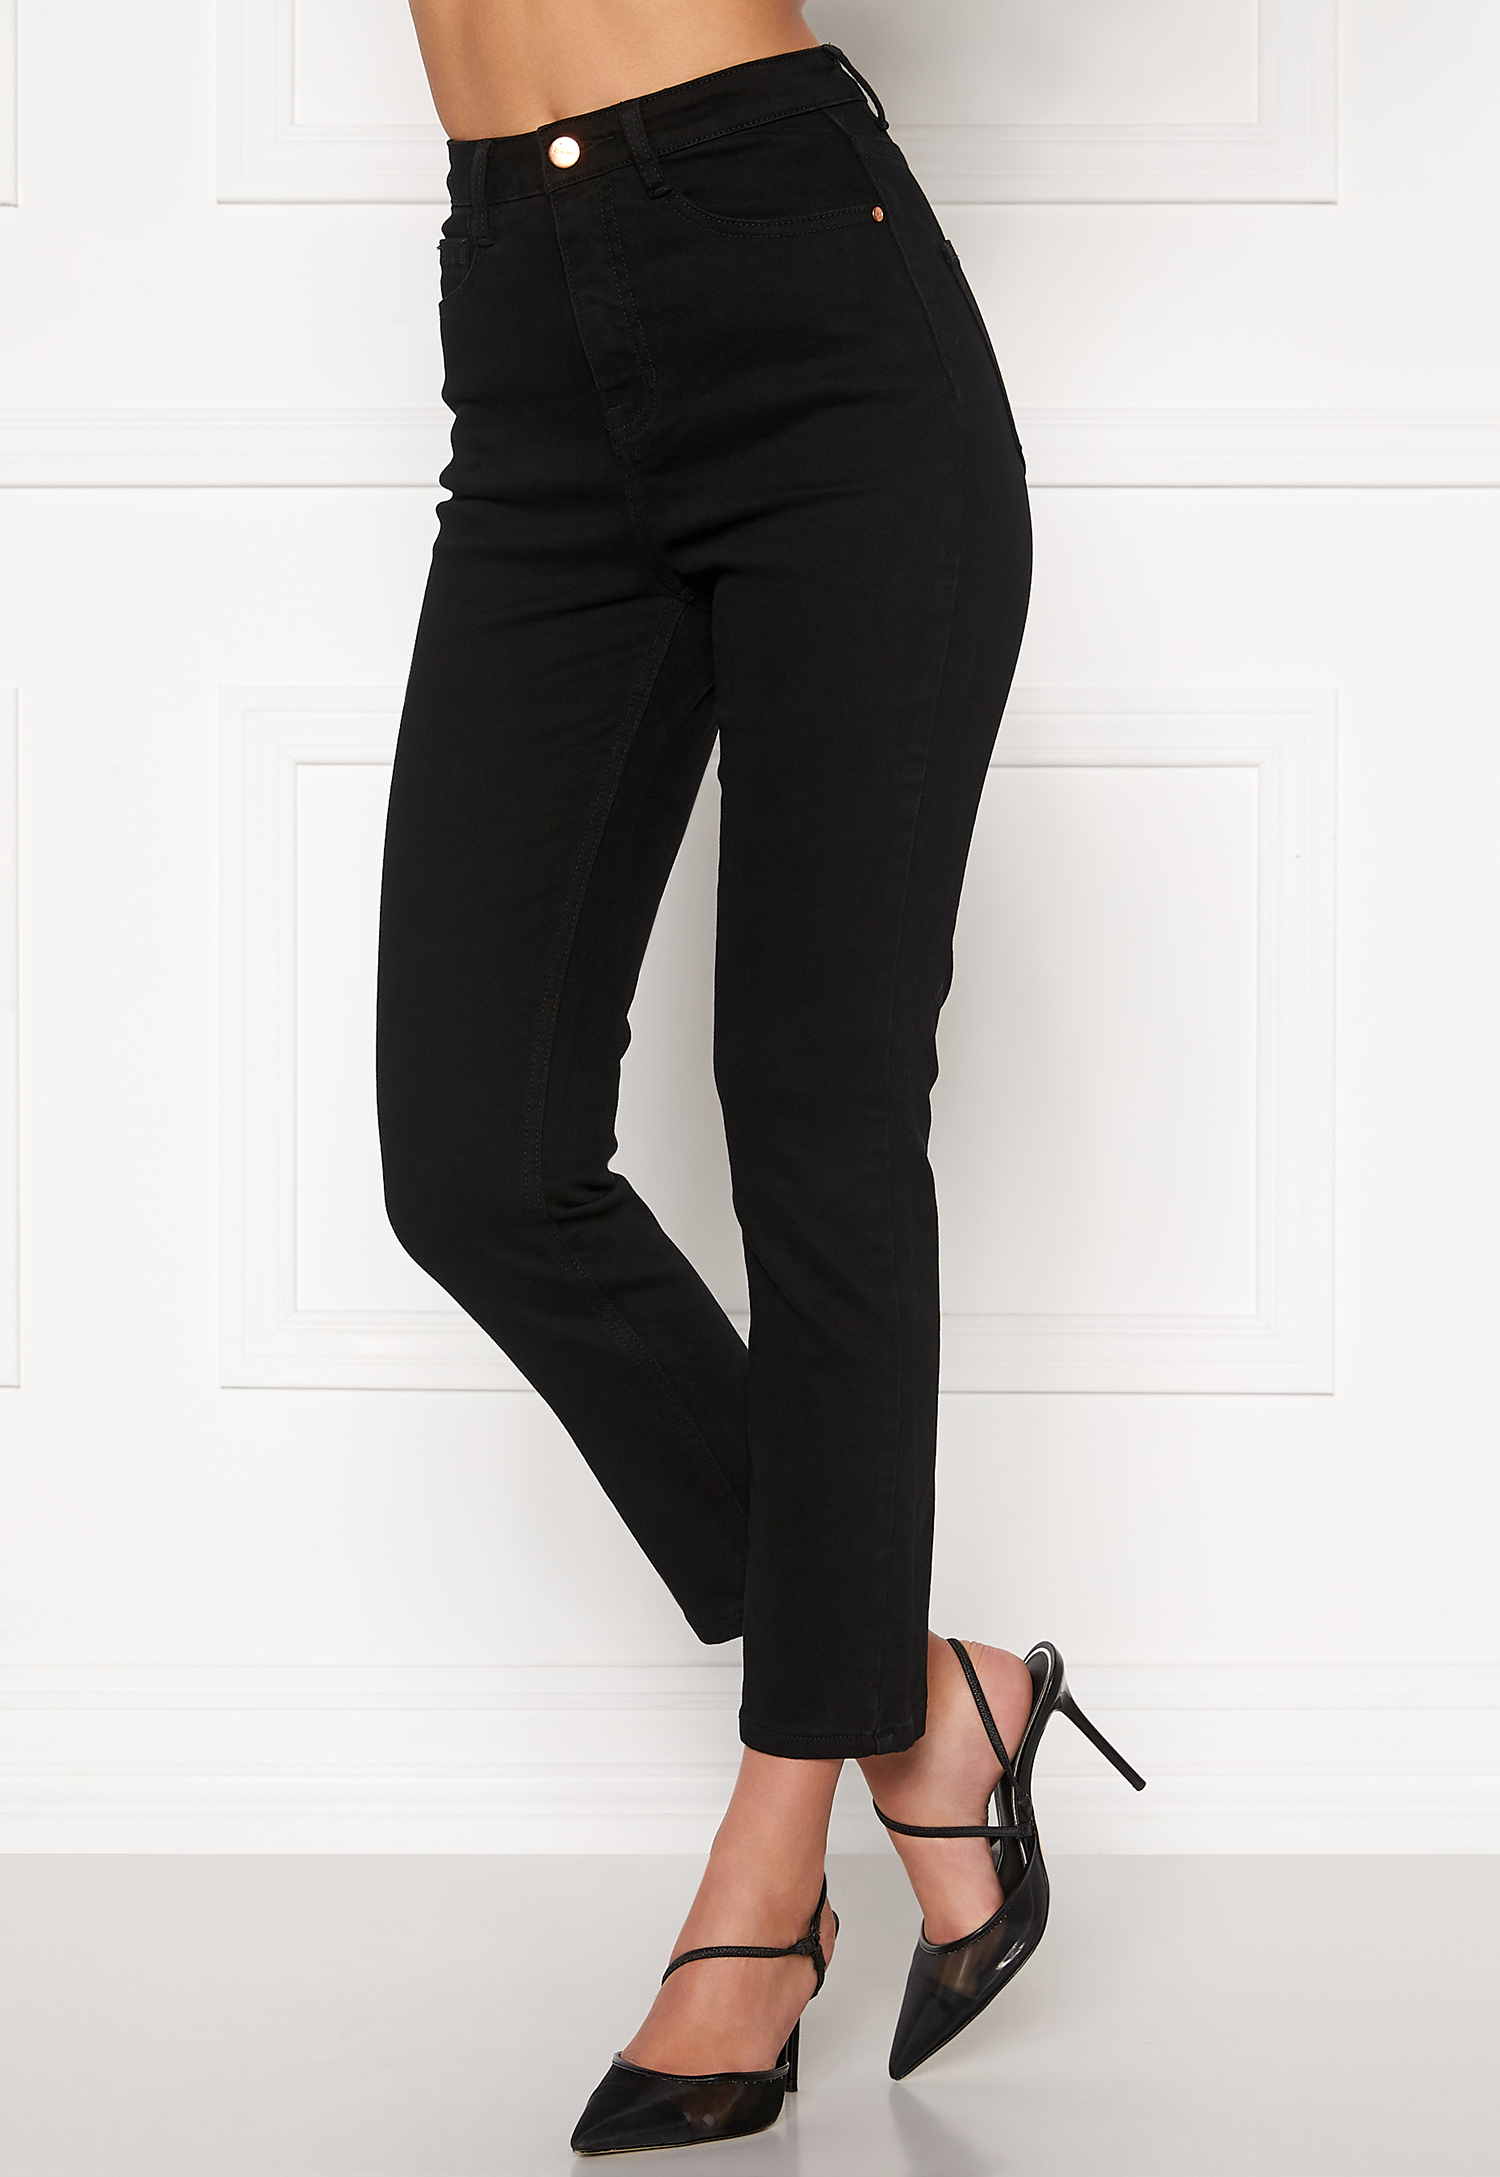 bubbleroom-katy-high-waist-semi-stretch-jeans